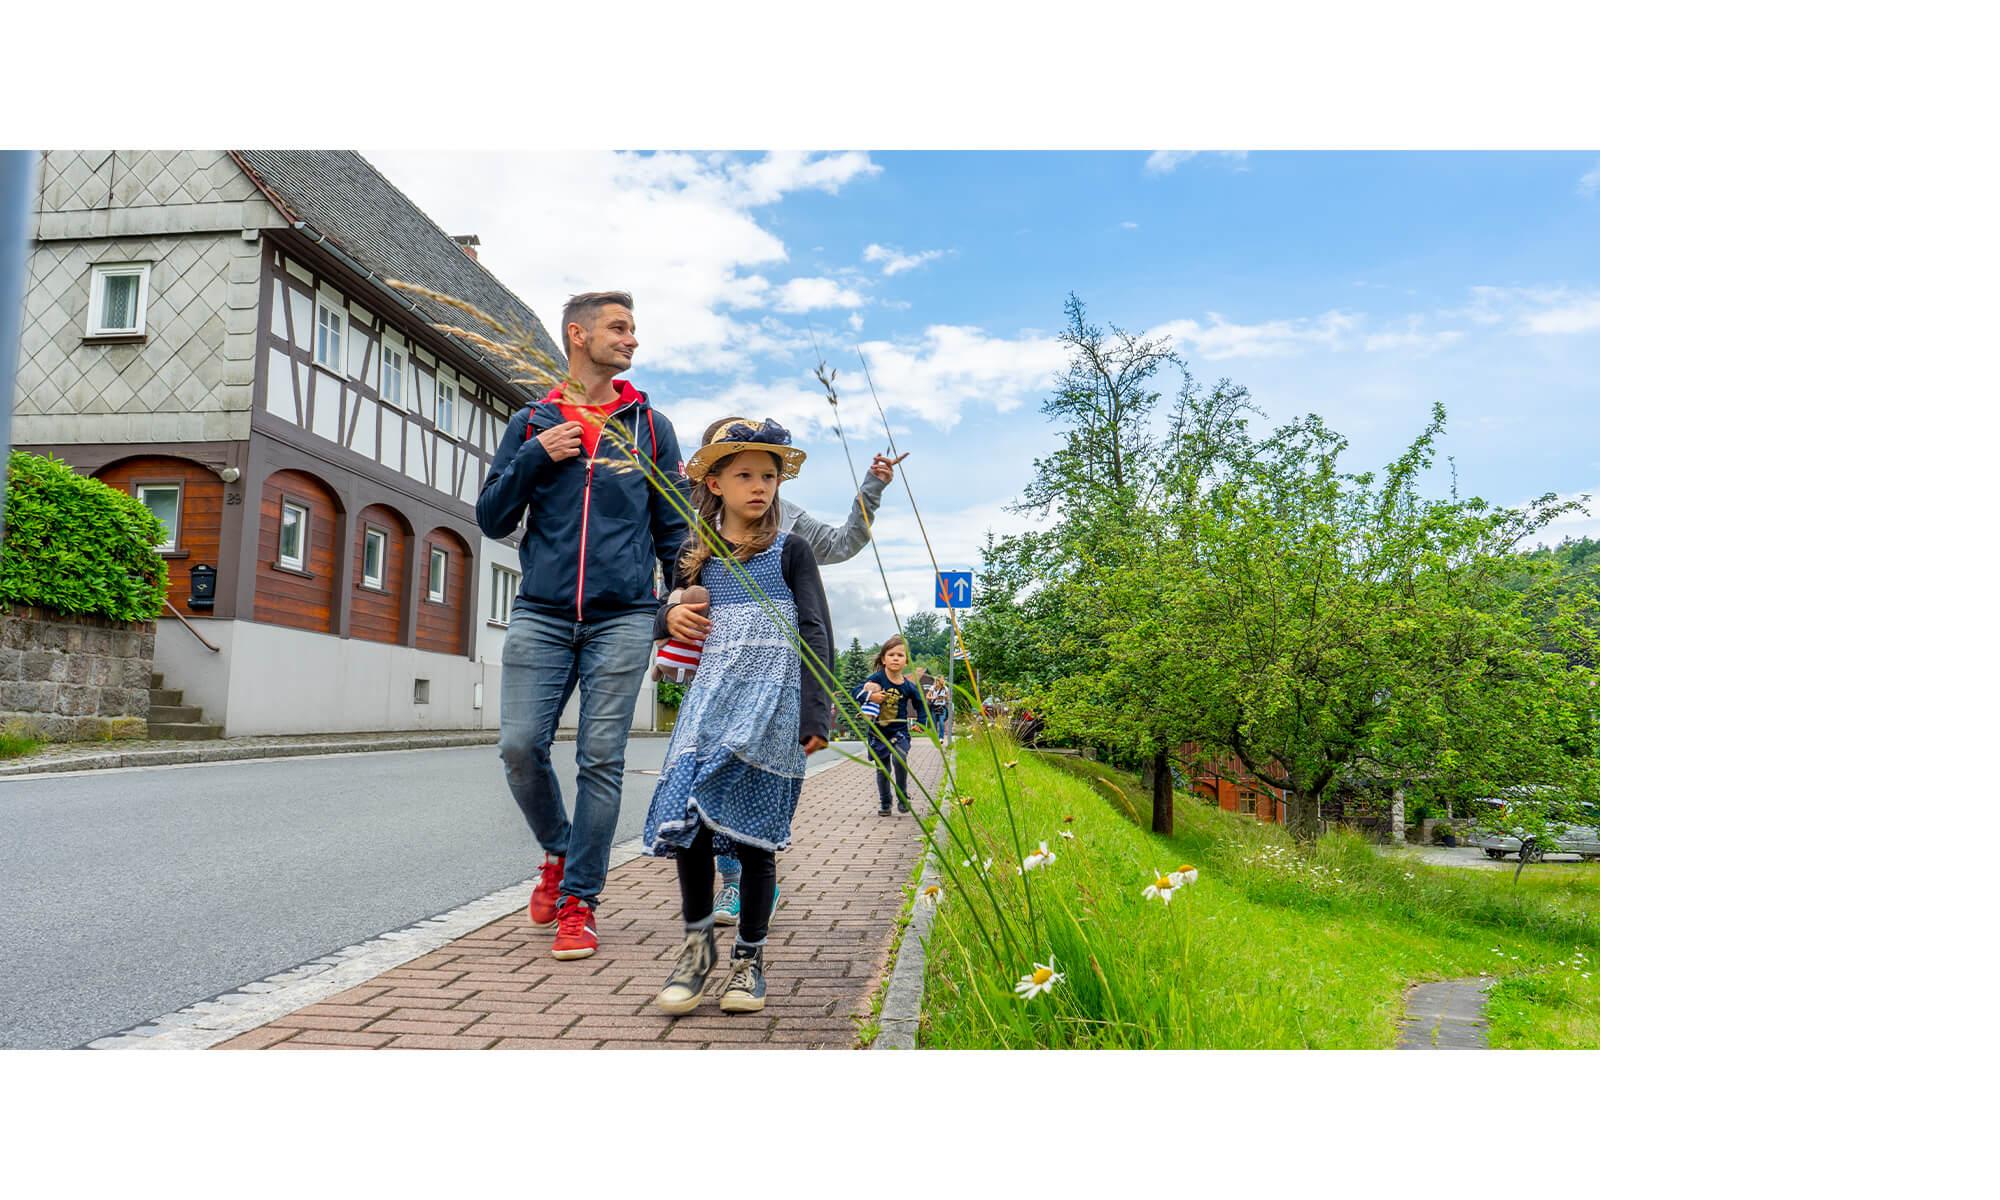 Reisebericht-Trixi-Ferienpark-02